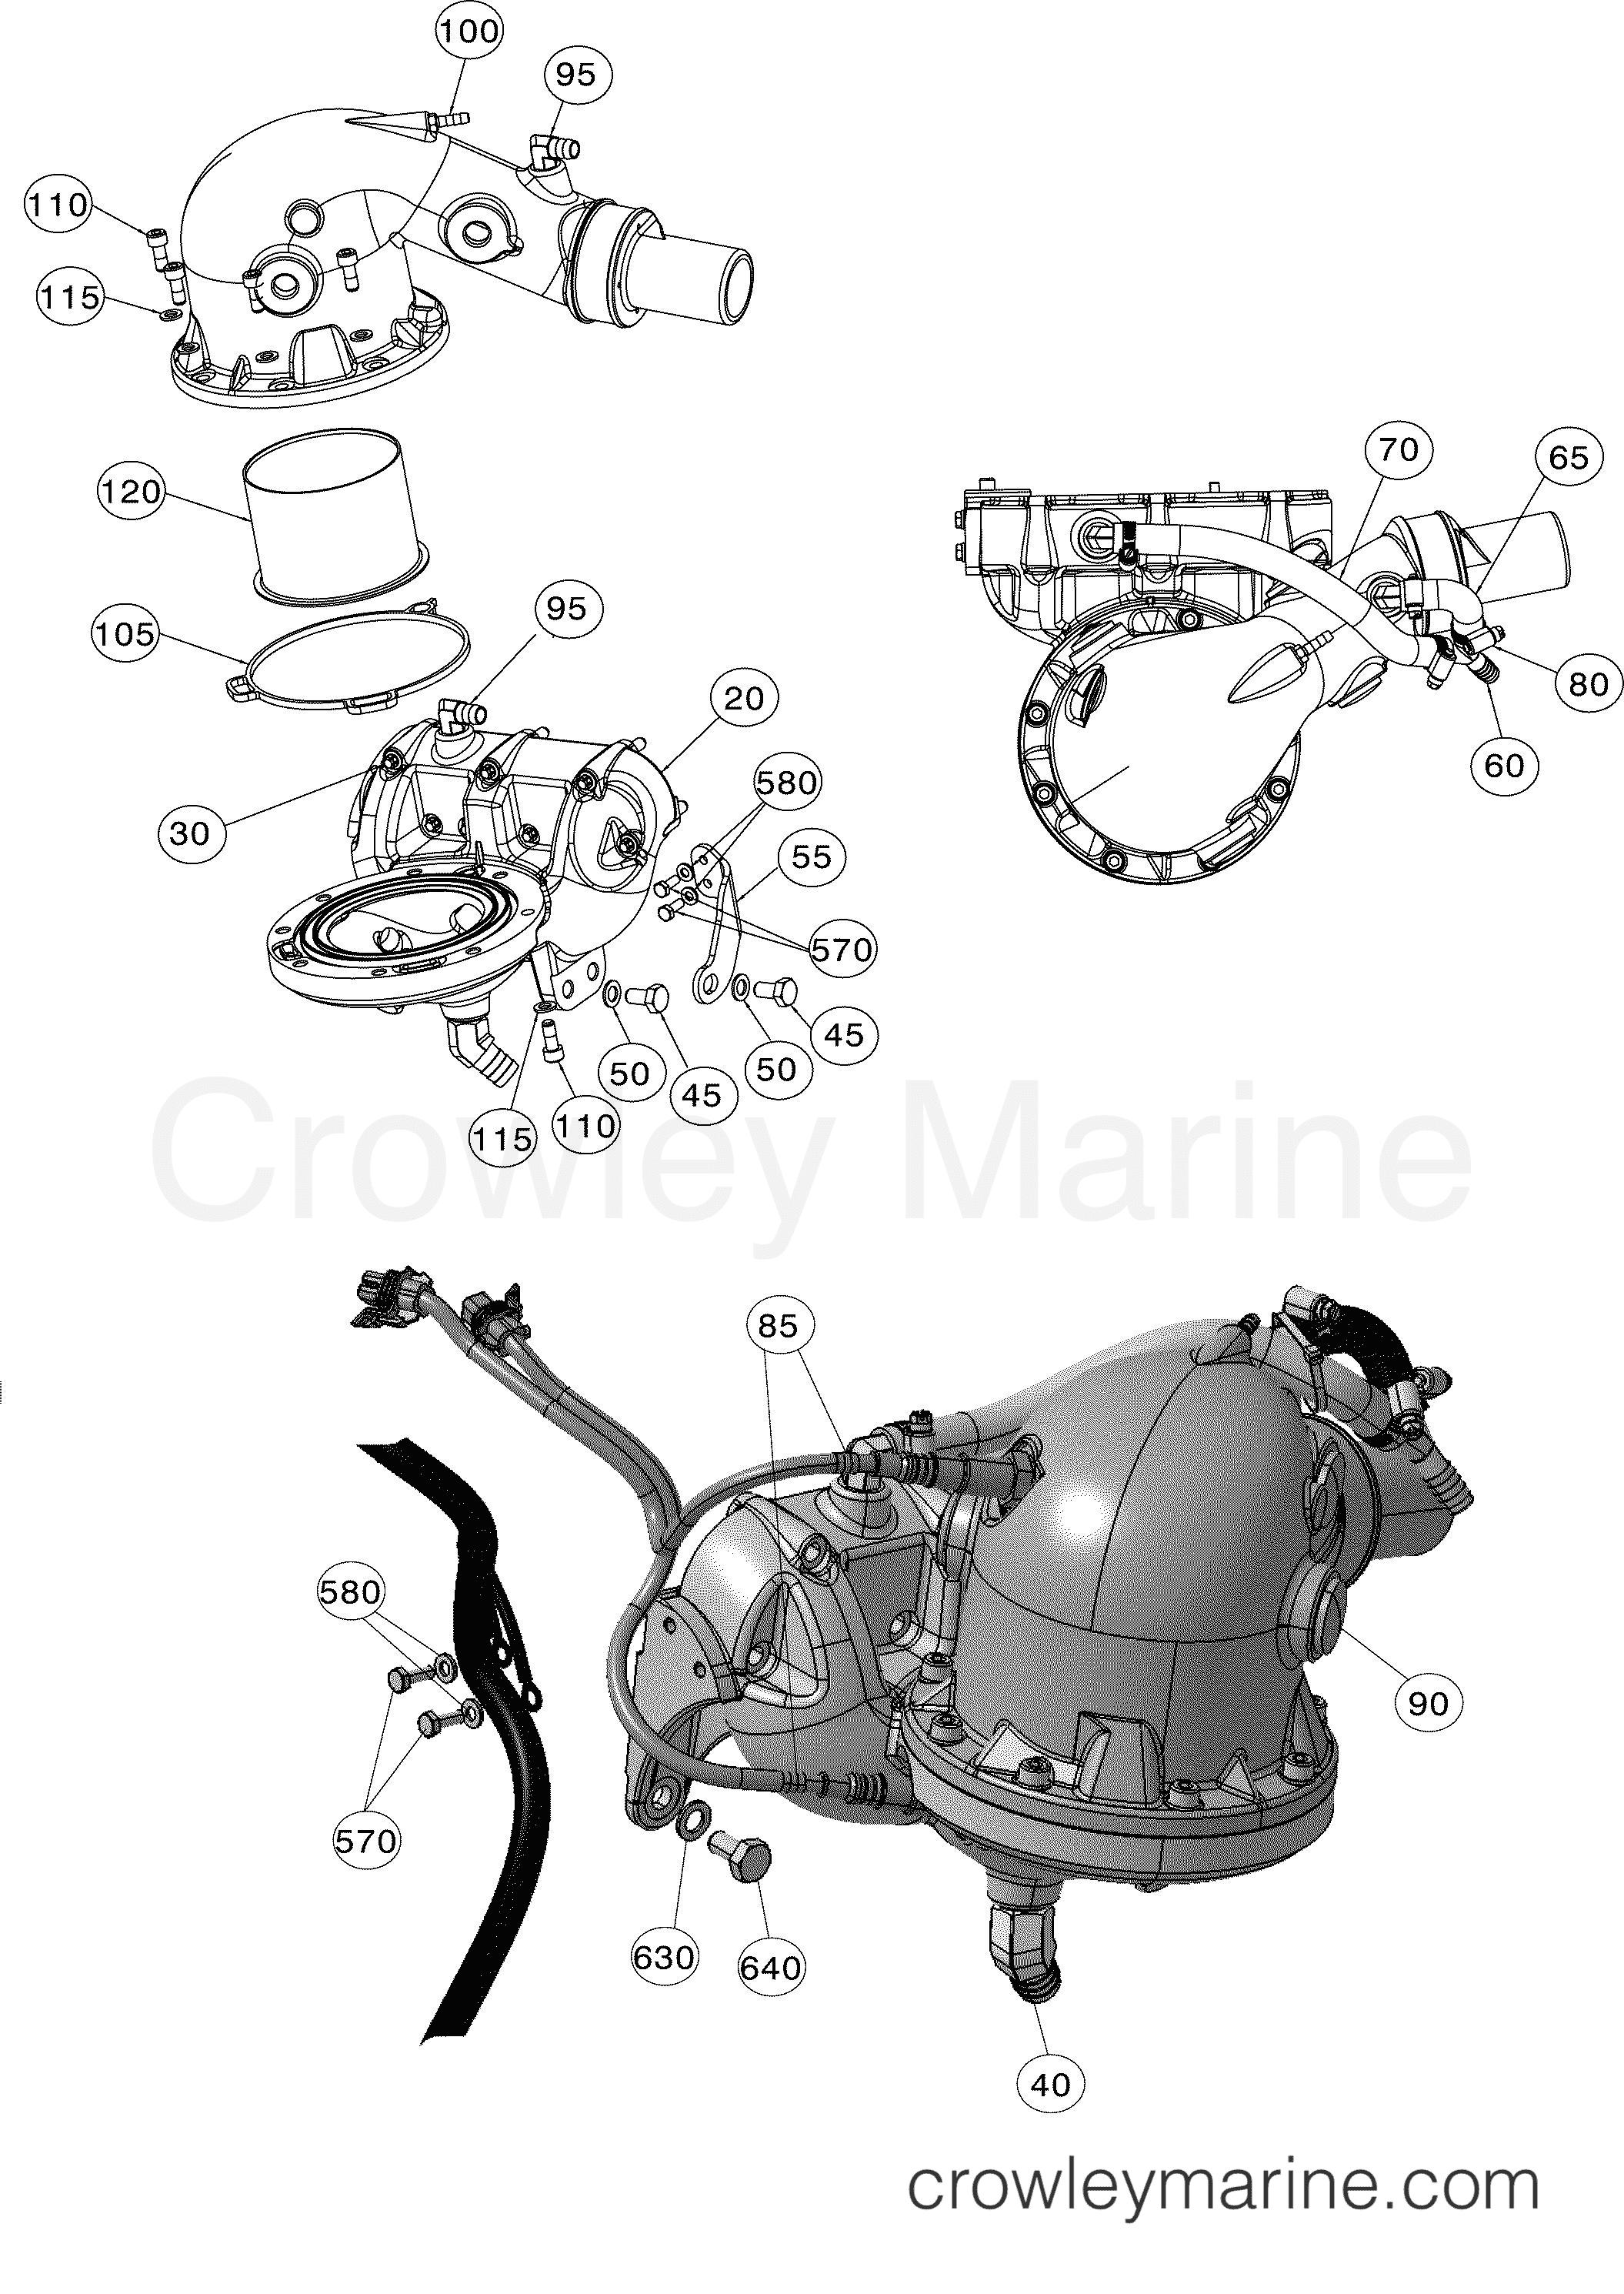 Catalyst Ab Rotax Powertrains 90 440030aba Crowley Marine Engine Diagram Section